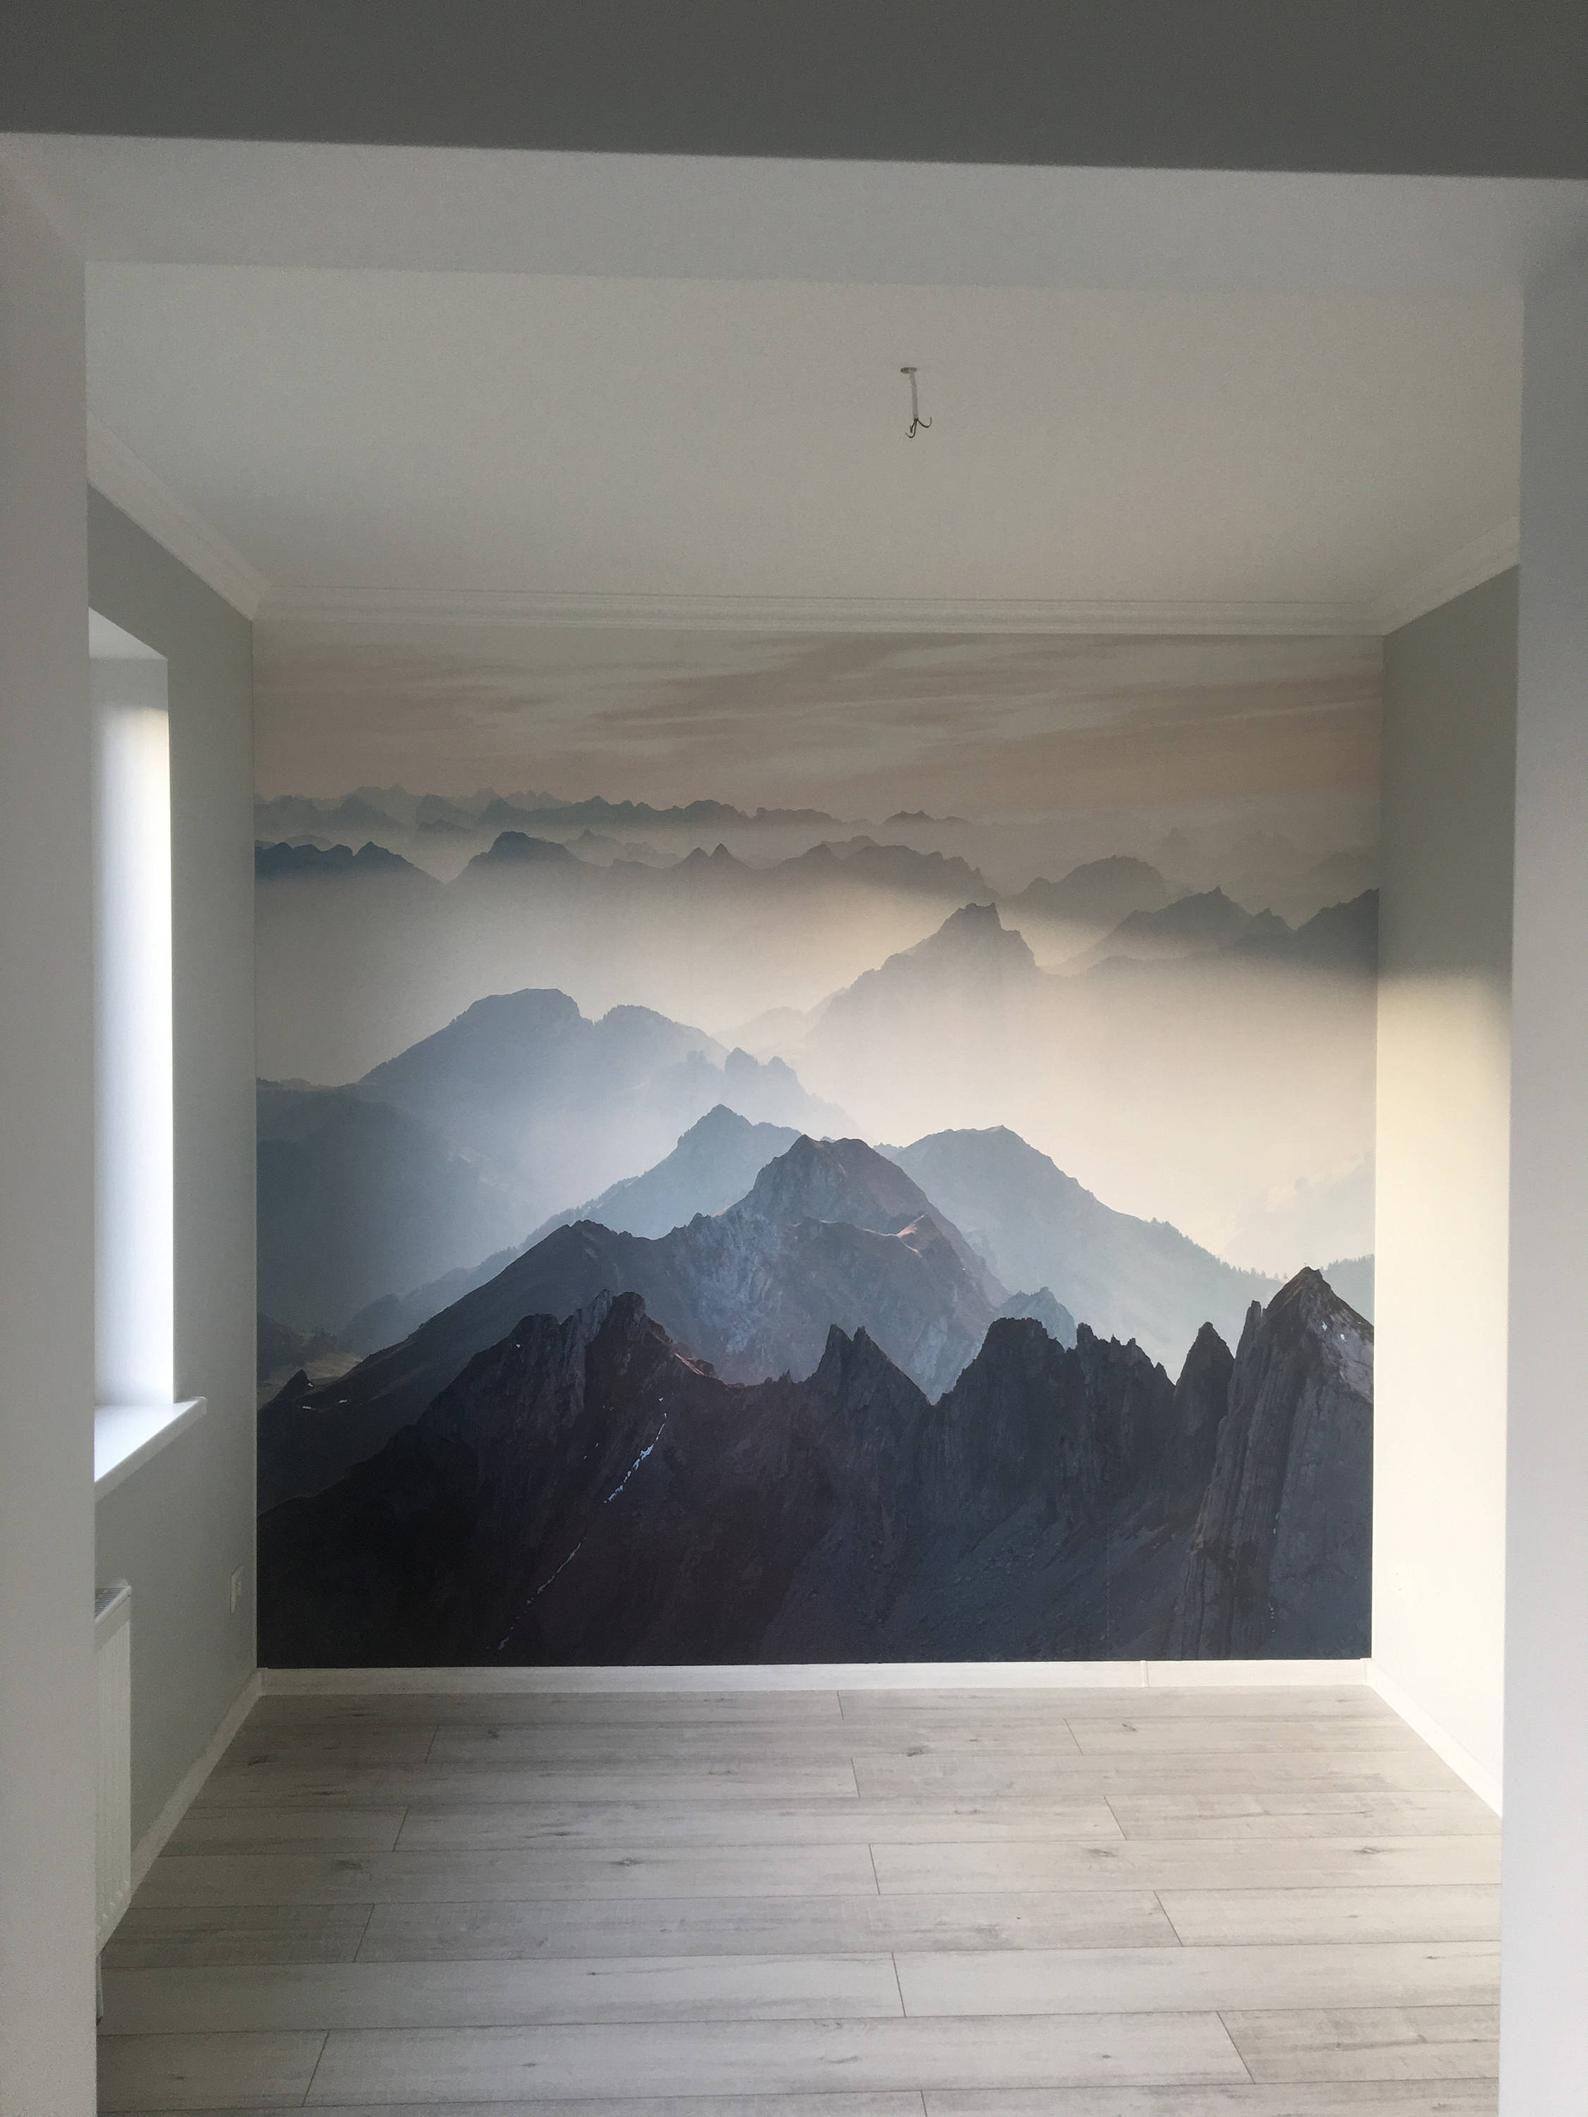 Mystical Mountains mural, Misty Mountain Shadow, Hazy